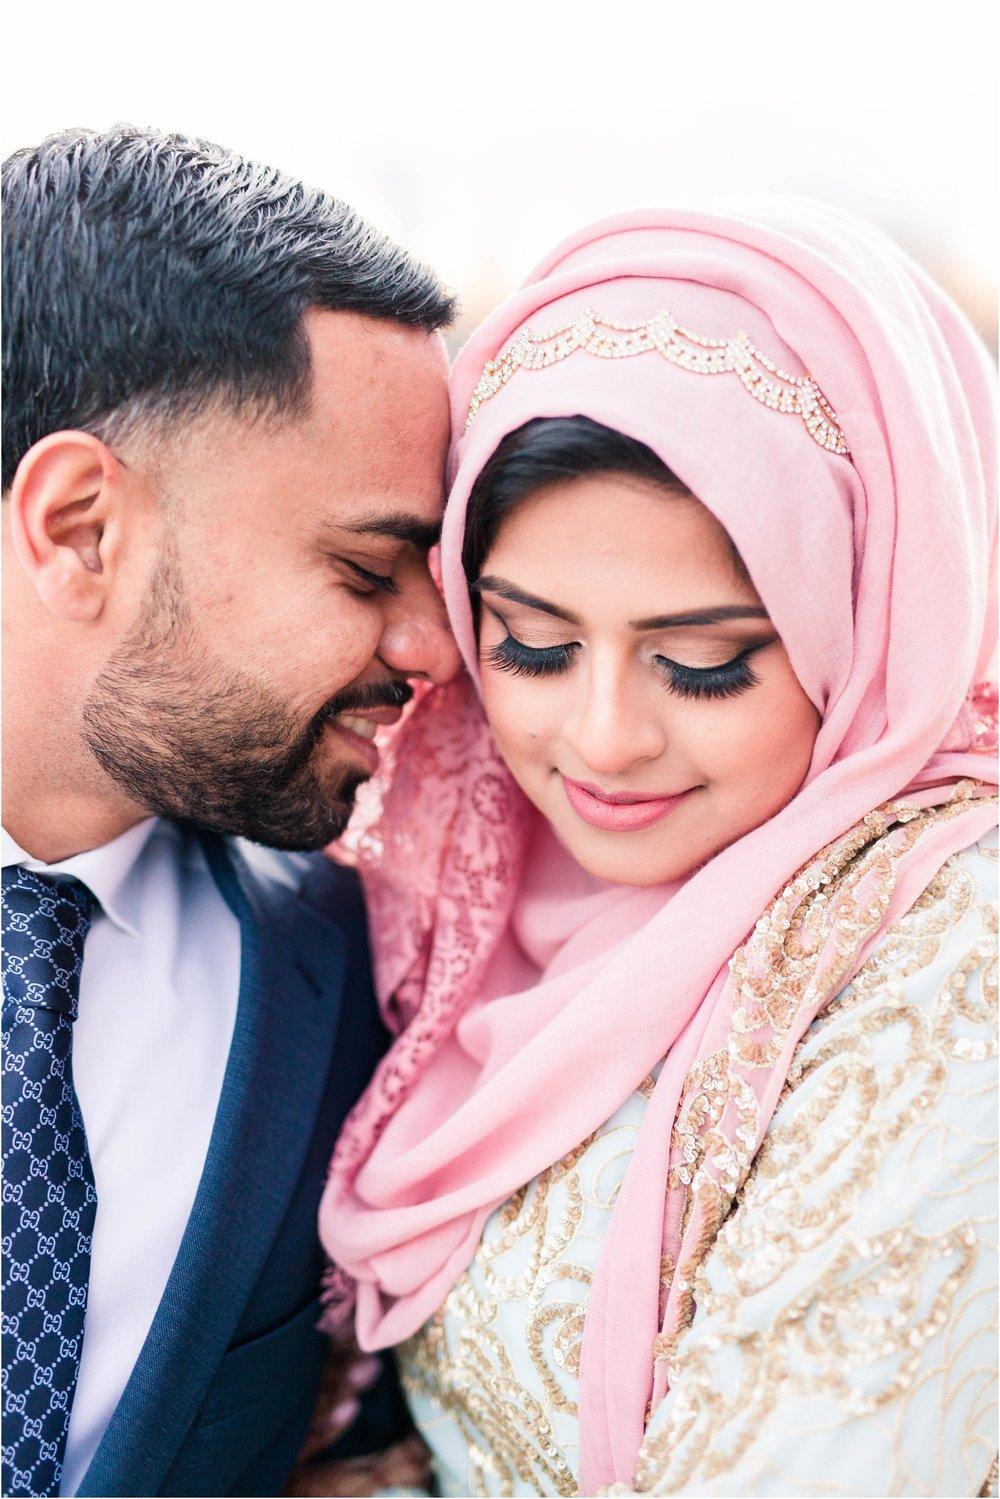 Best-of-2017-Weddings-Toronto-Mississauga-Brampton-Scarborough-GTA-Pakistani-Indian-Wedding-Engagement-Photographer-Photography_0014.jpg